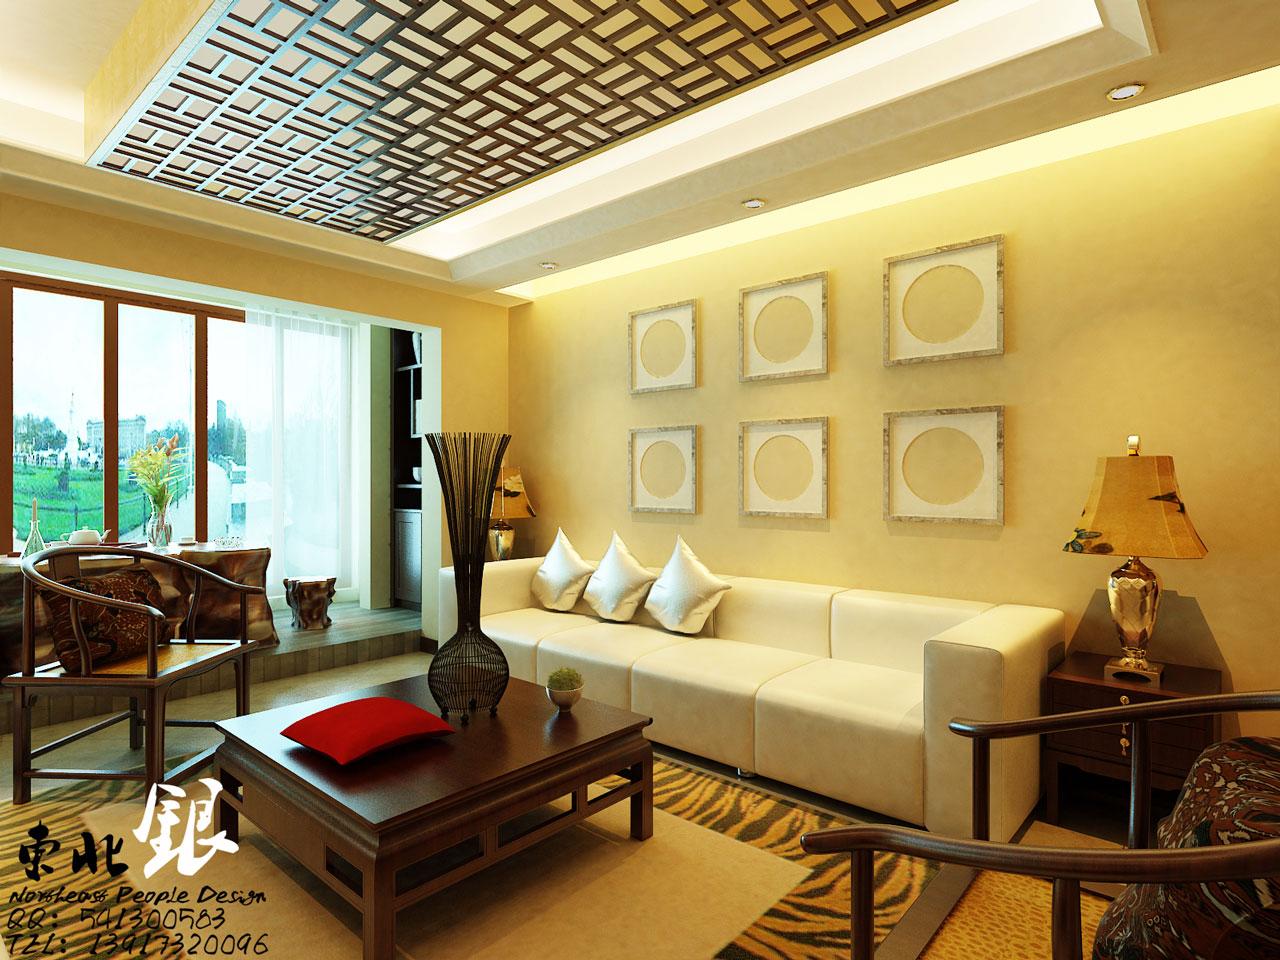 Oriental Wall Art - Elitflat